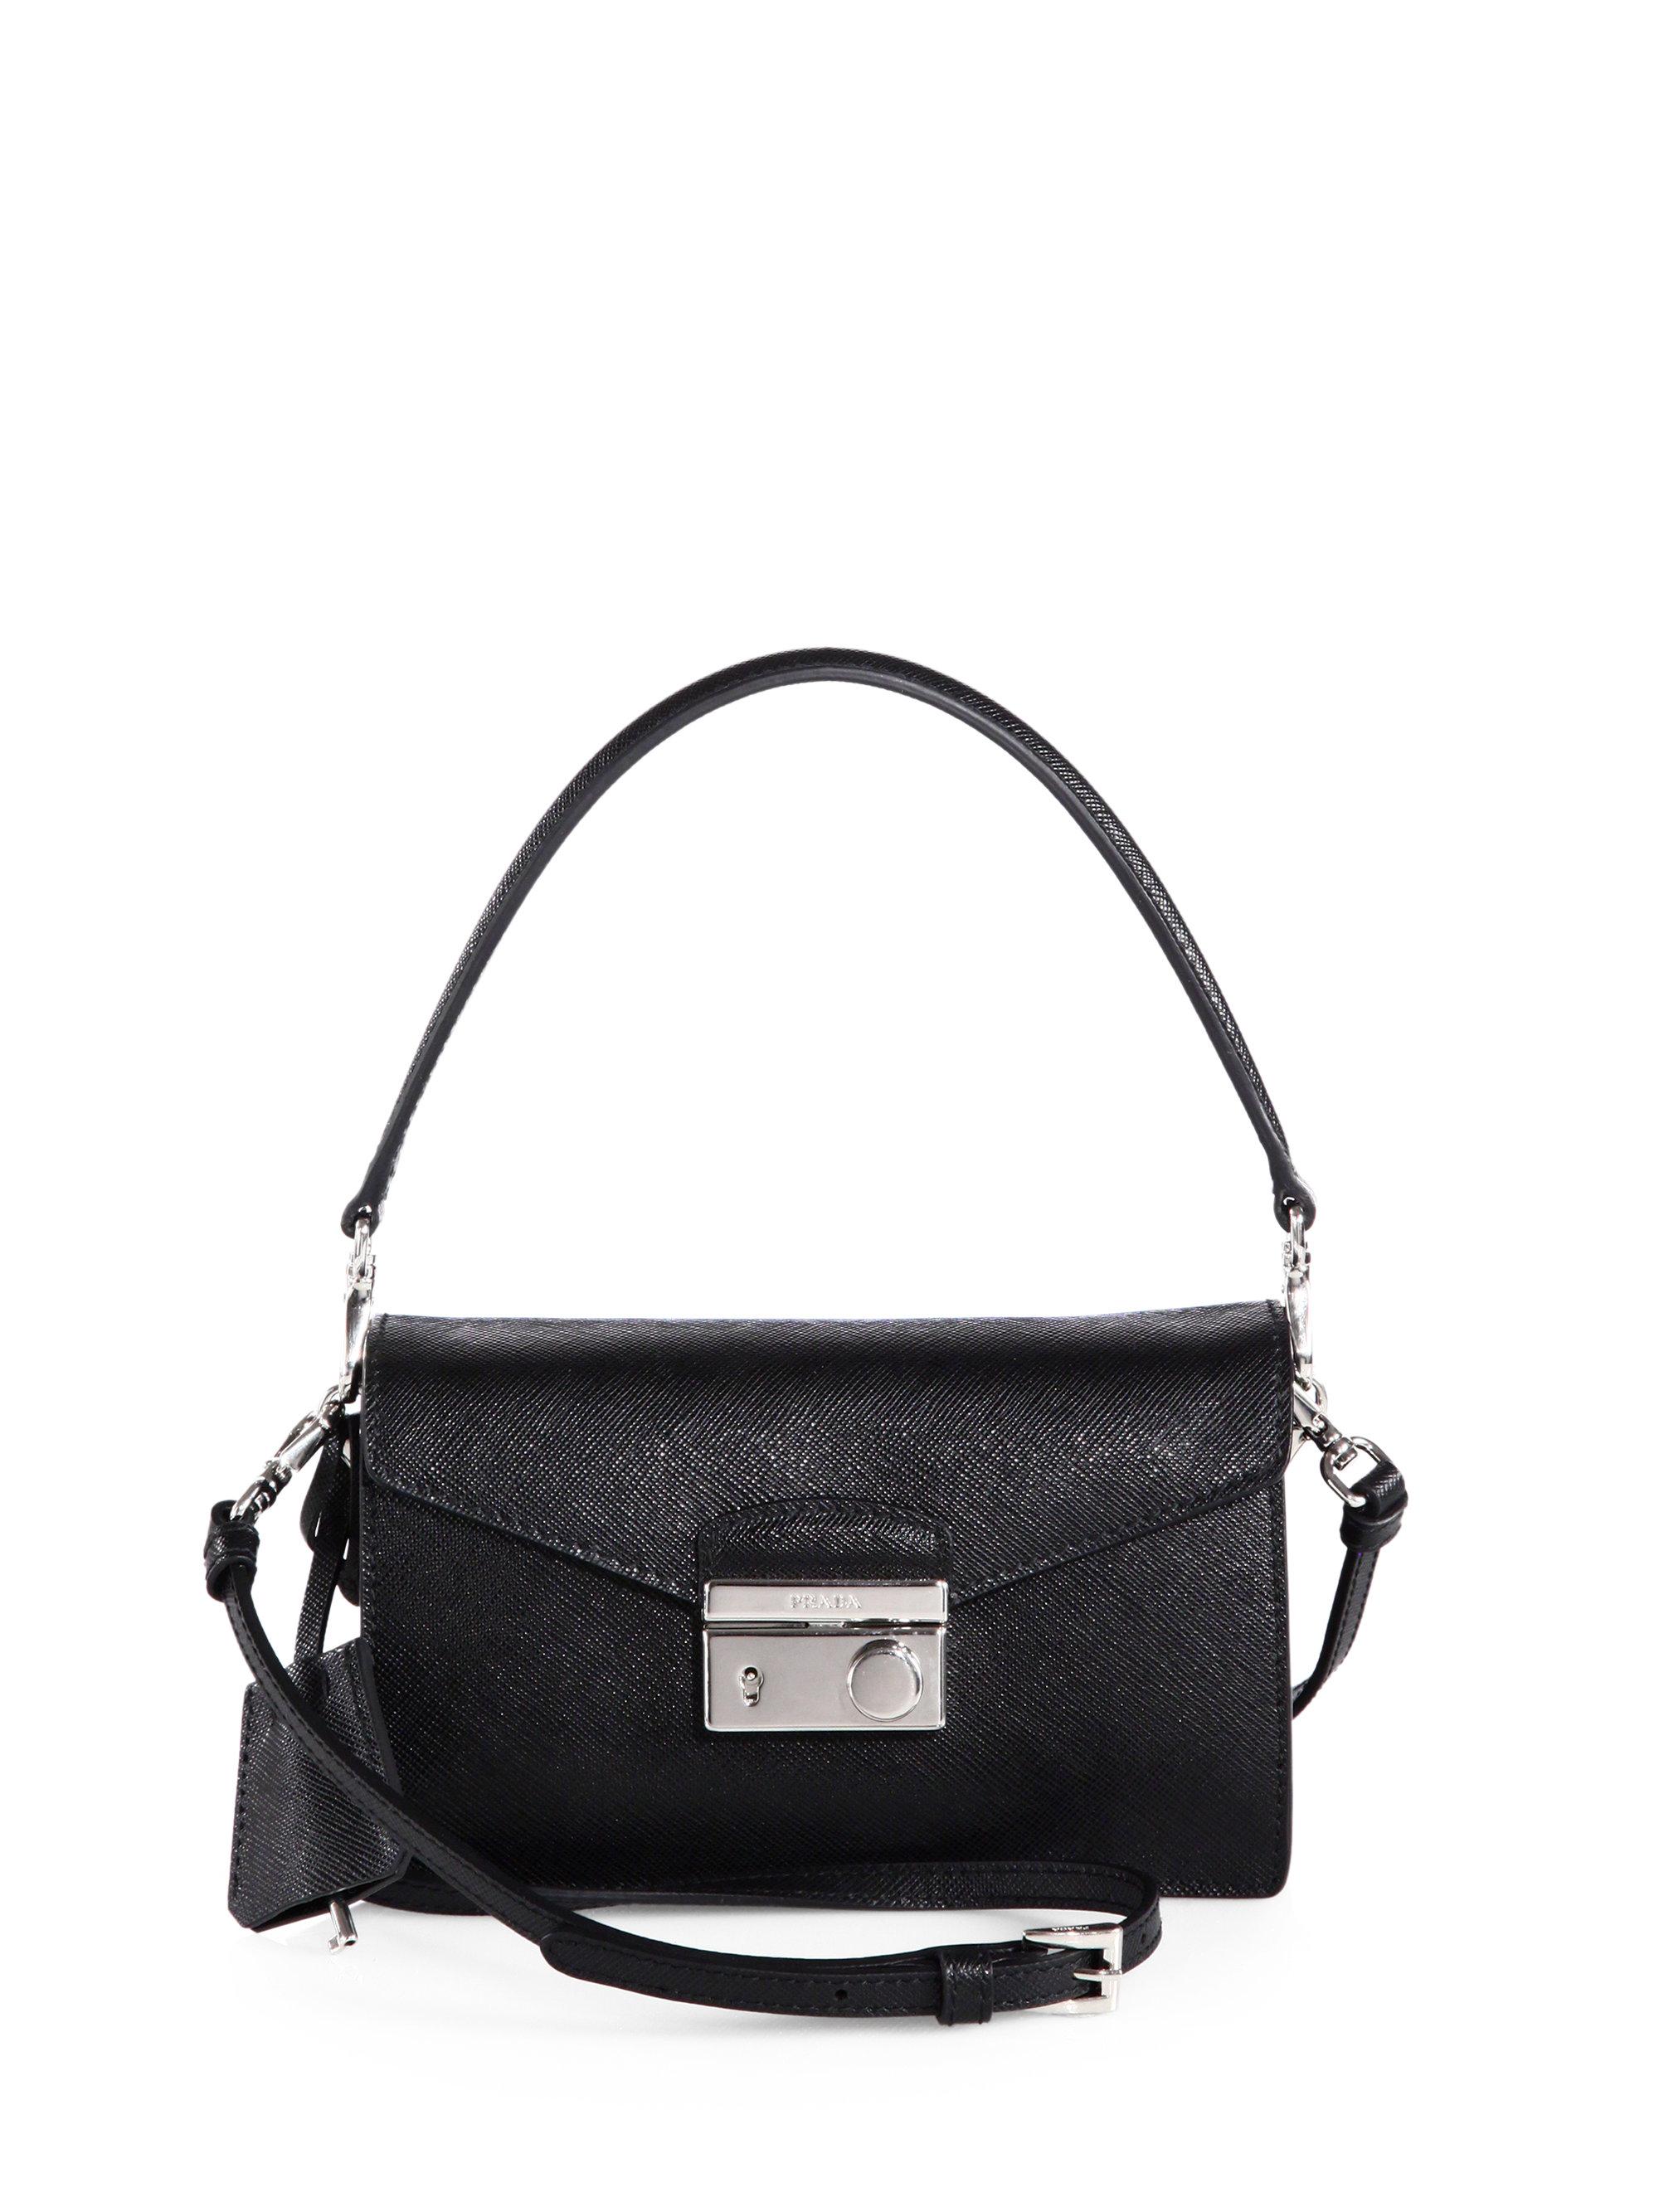 367315bd520b ... coupon code for lyst prada saffiano leather mini sound crossbody bag in  black 9a825 98367